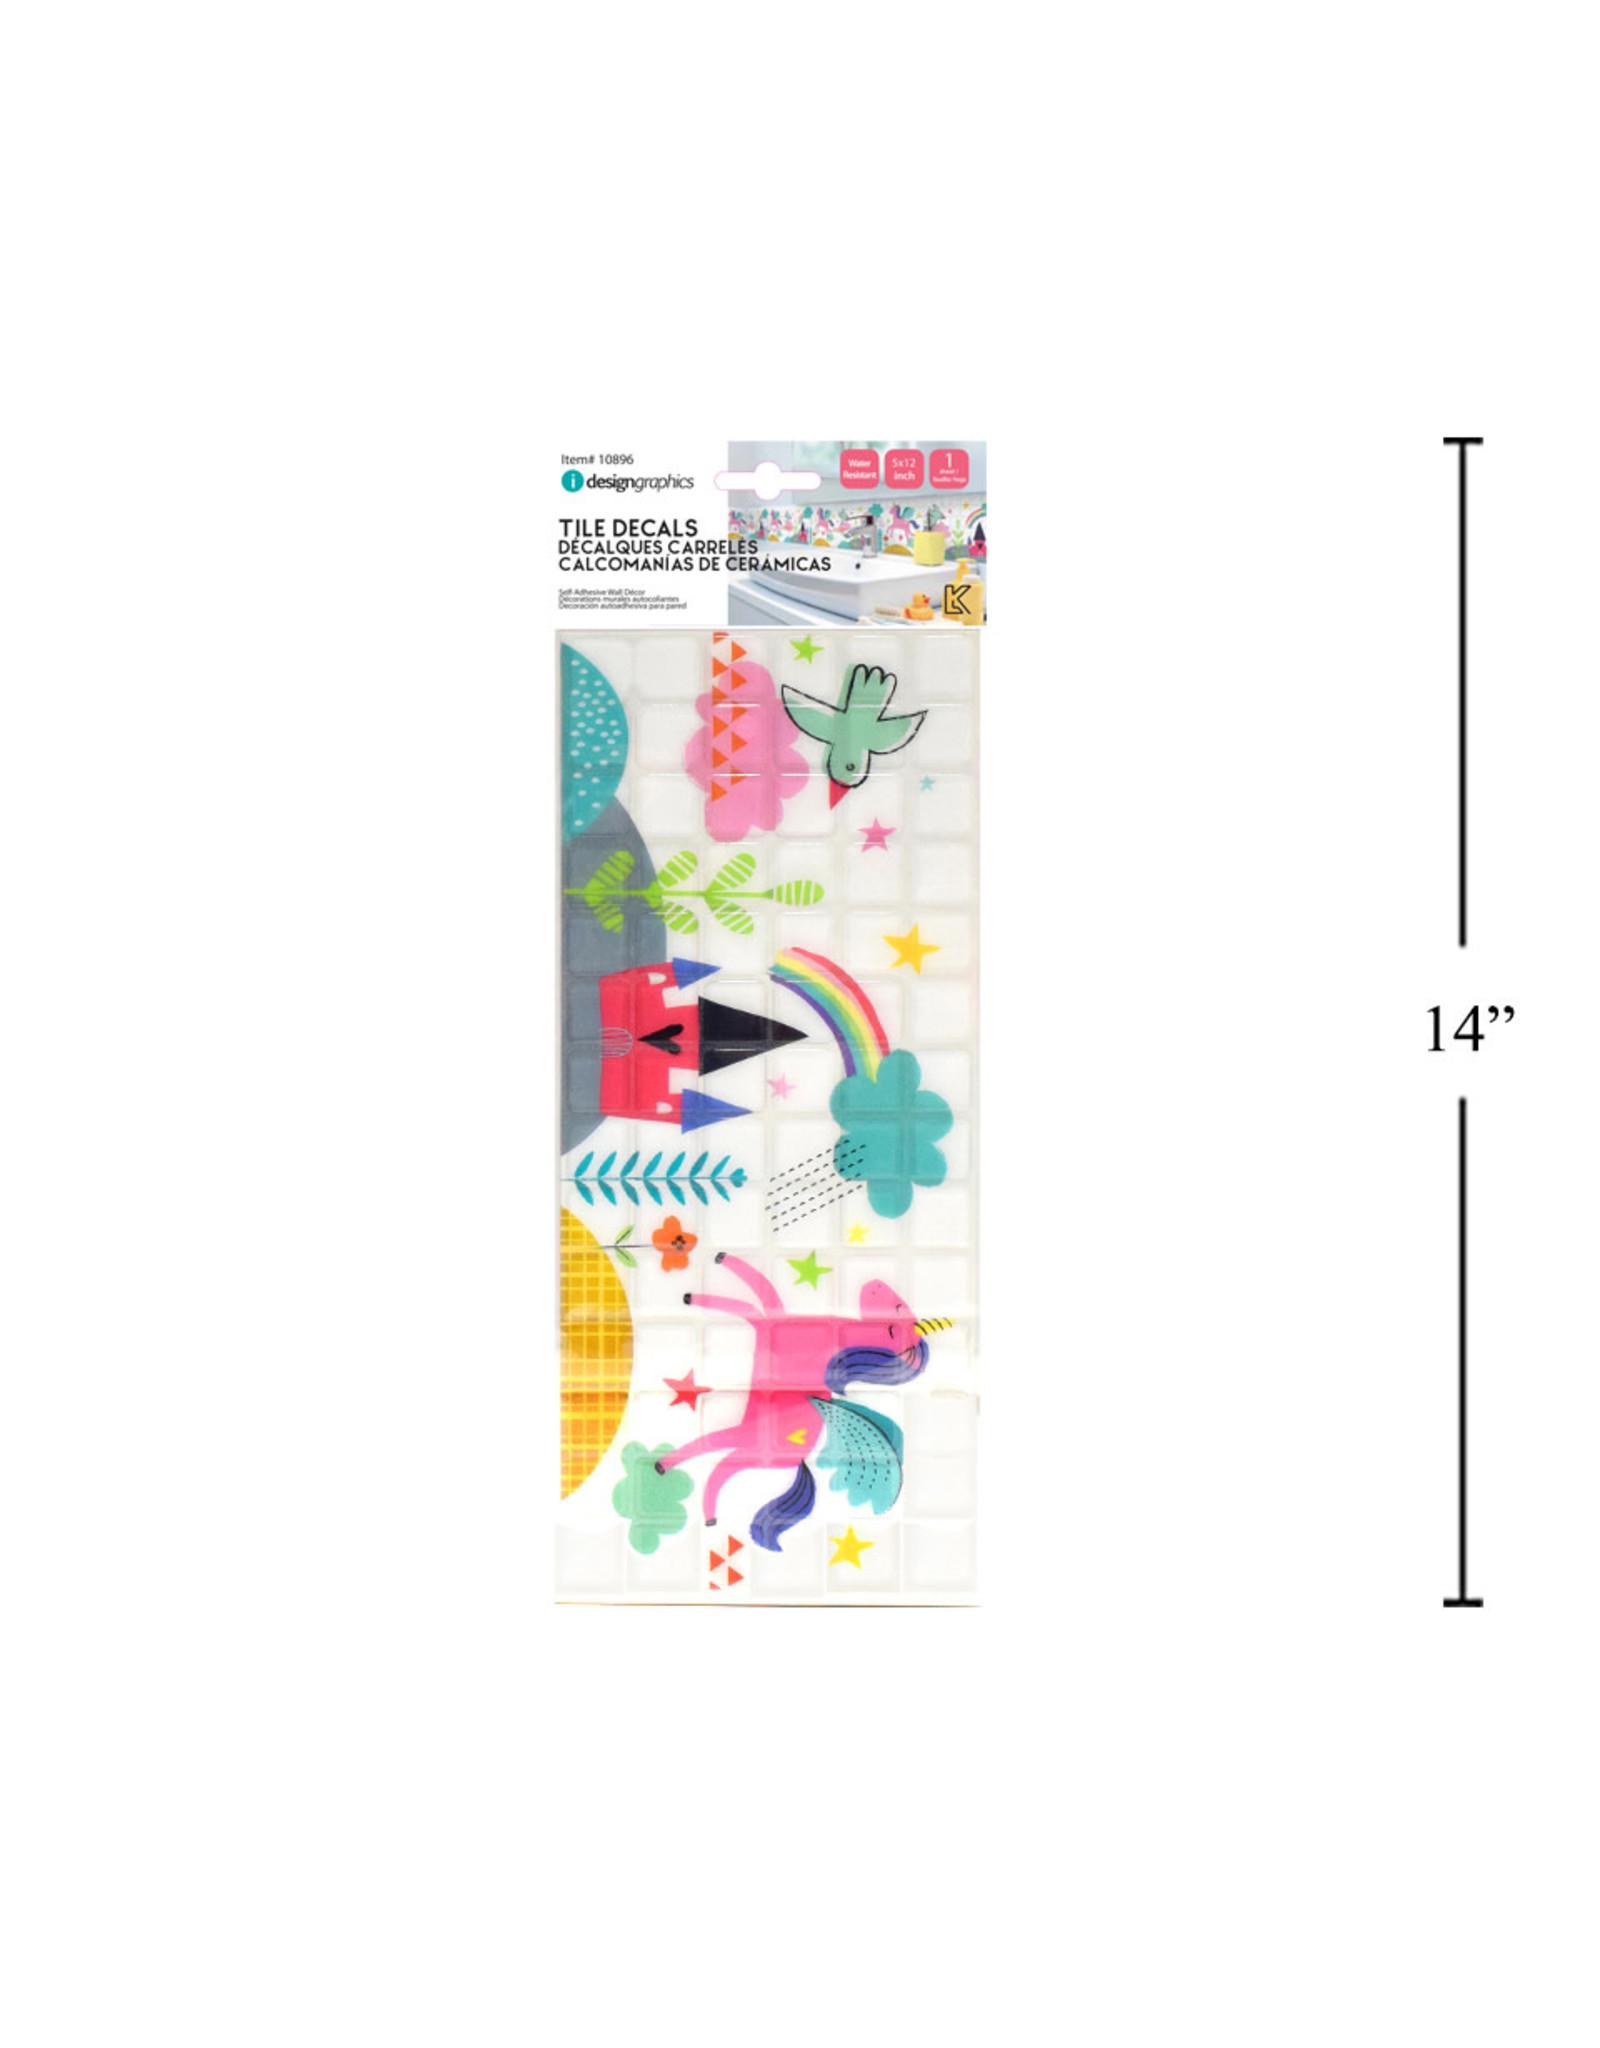 Unicorn Tile Decals